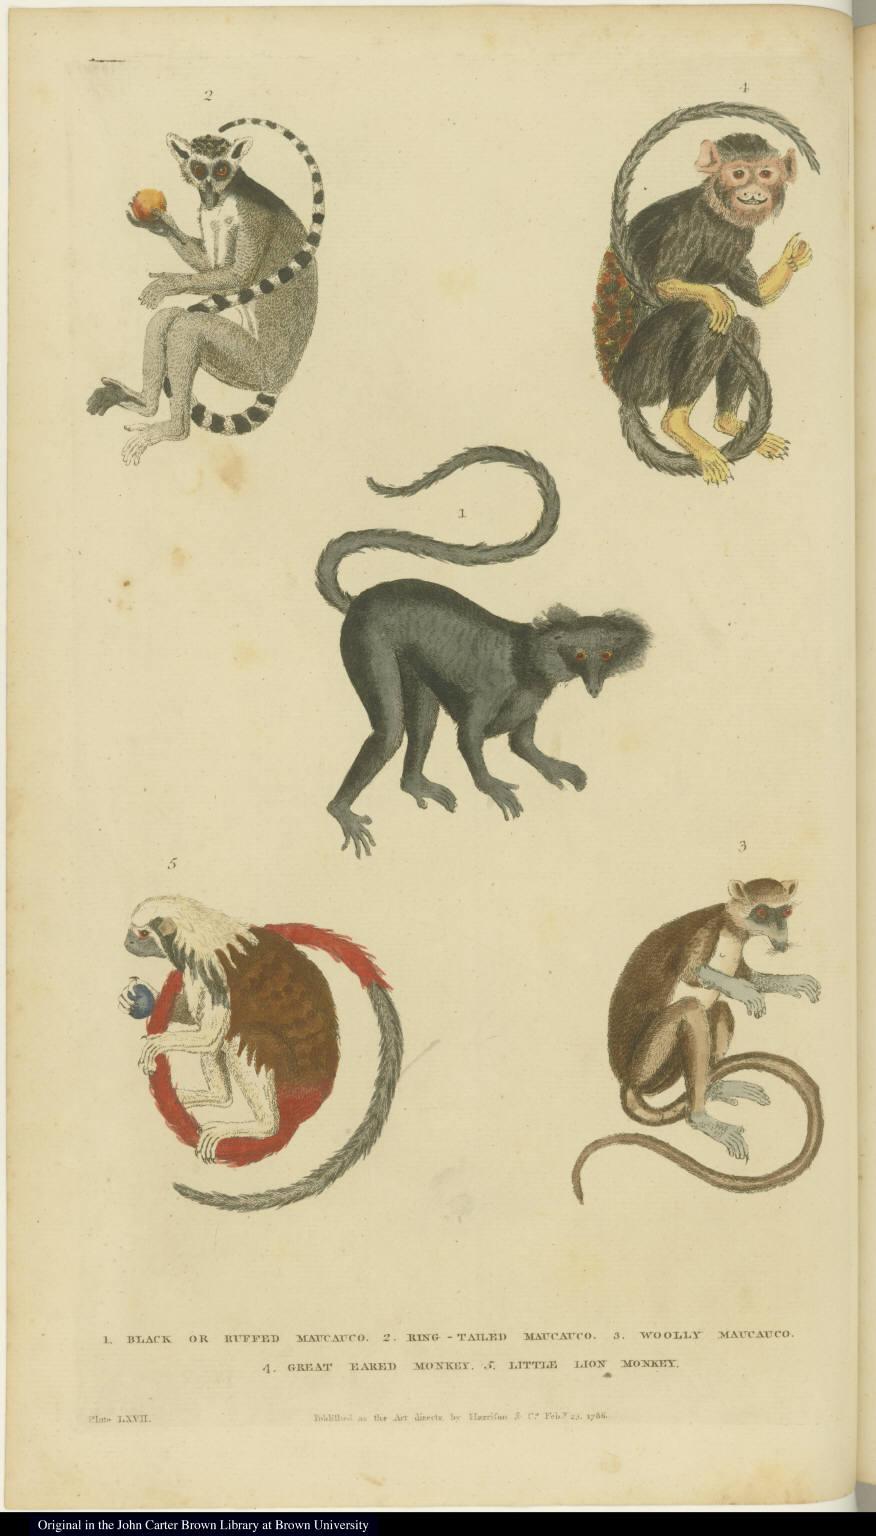 [Various monkeys and lemurs]